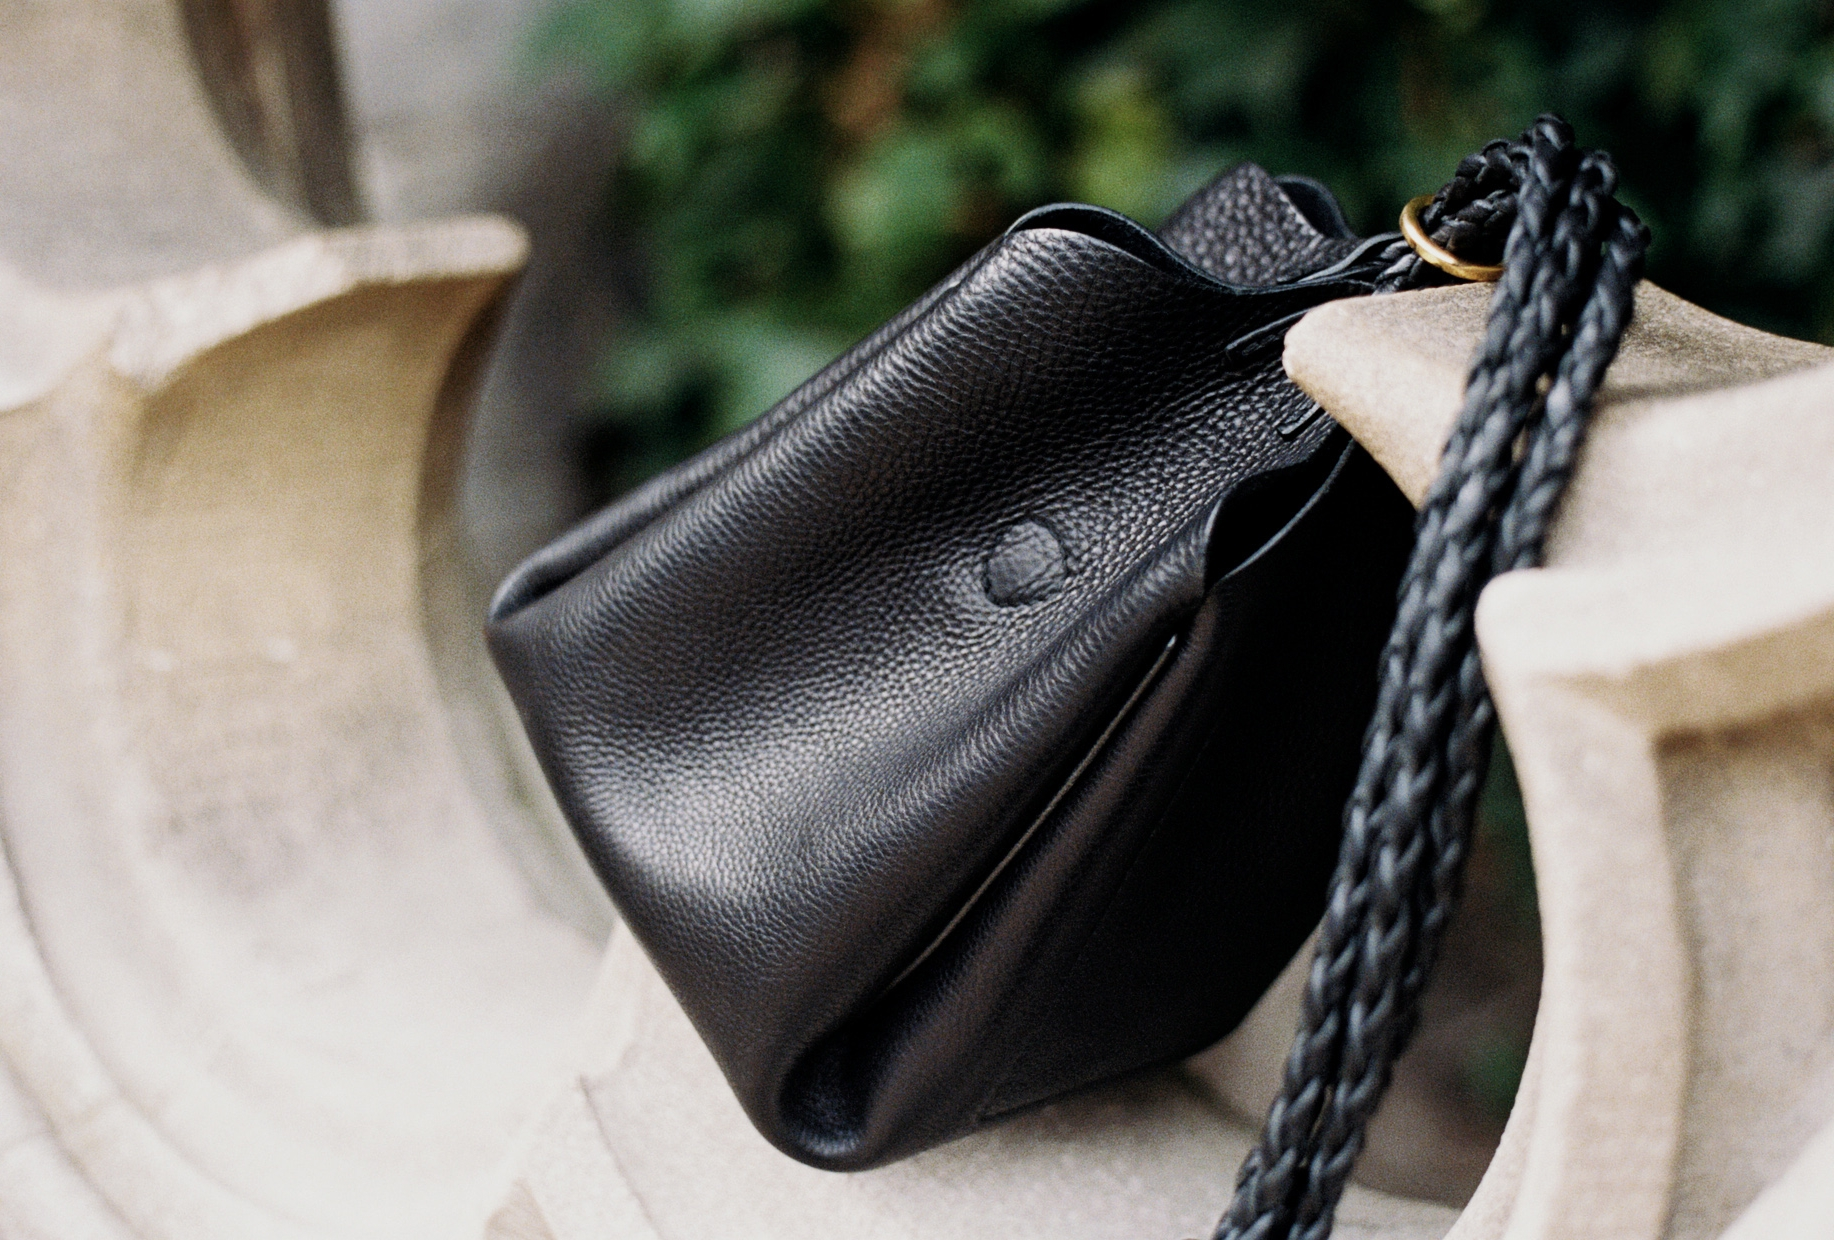 Copy of baluchon handbag mark tallowin luxury designer